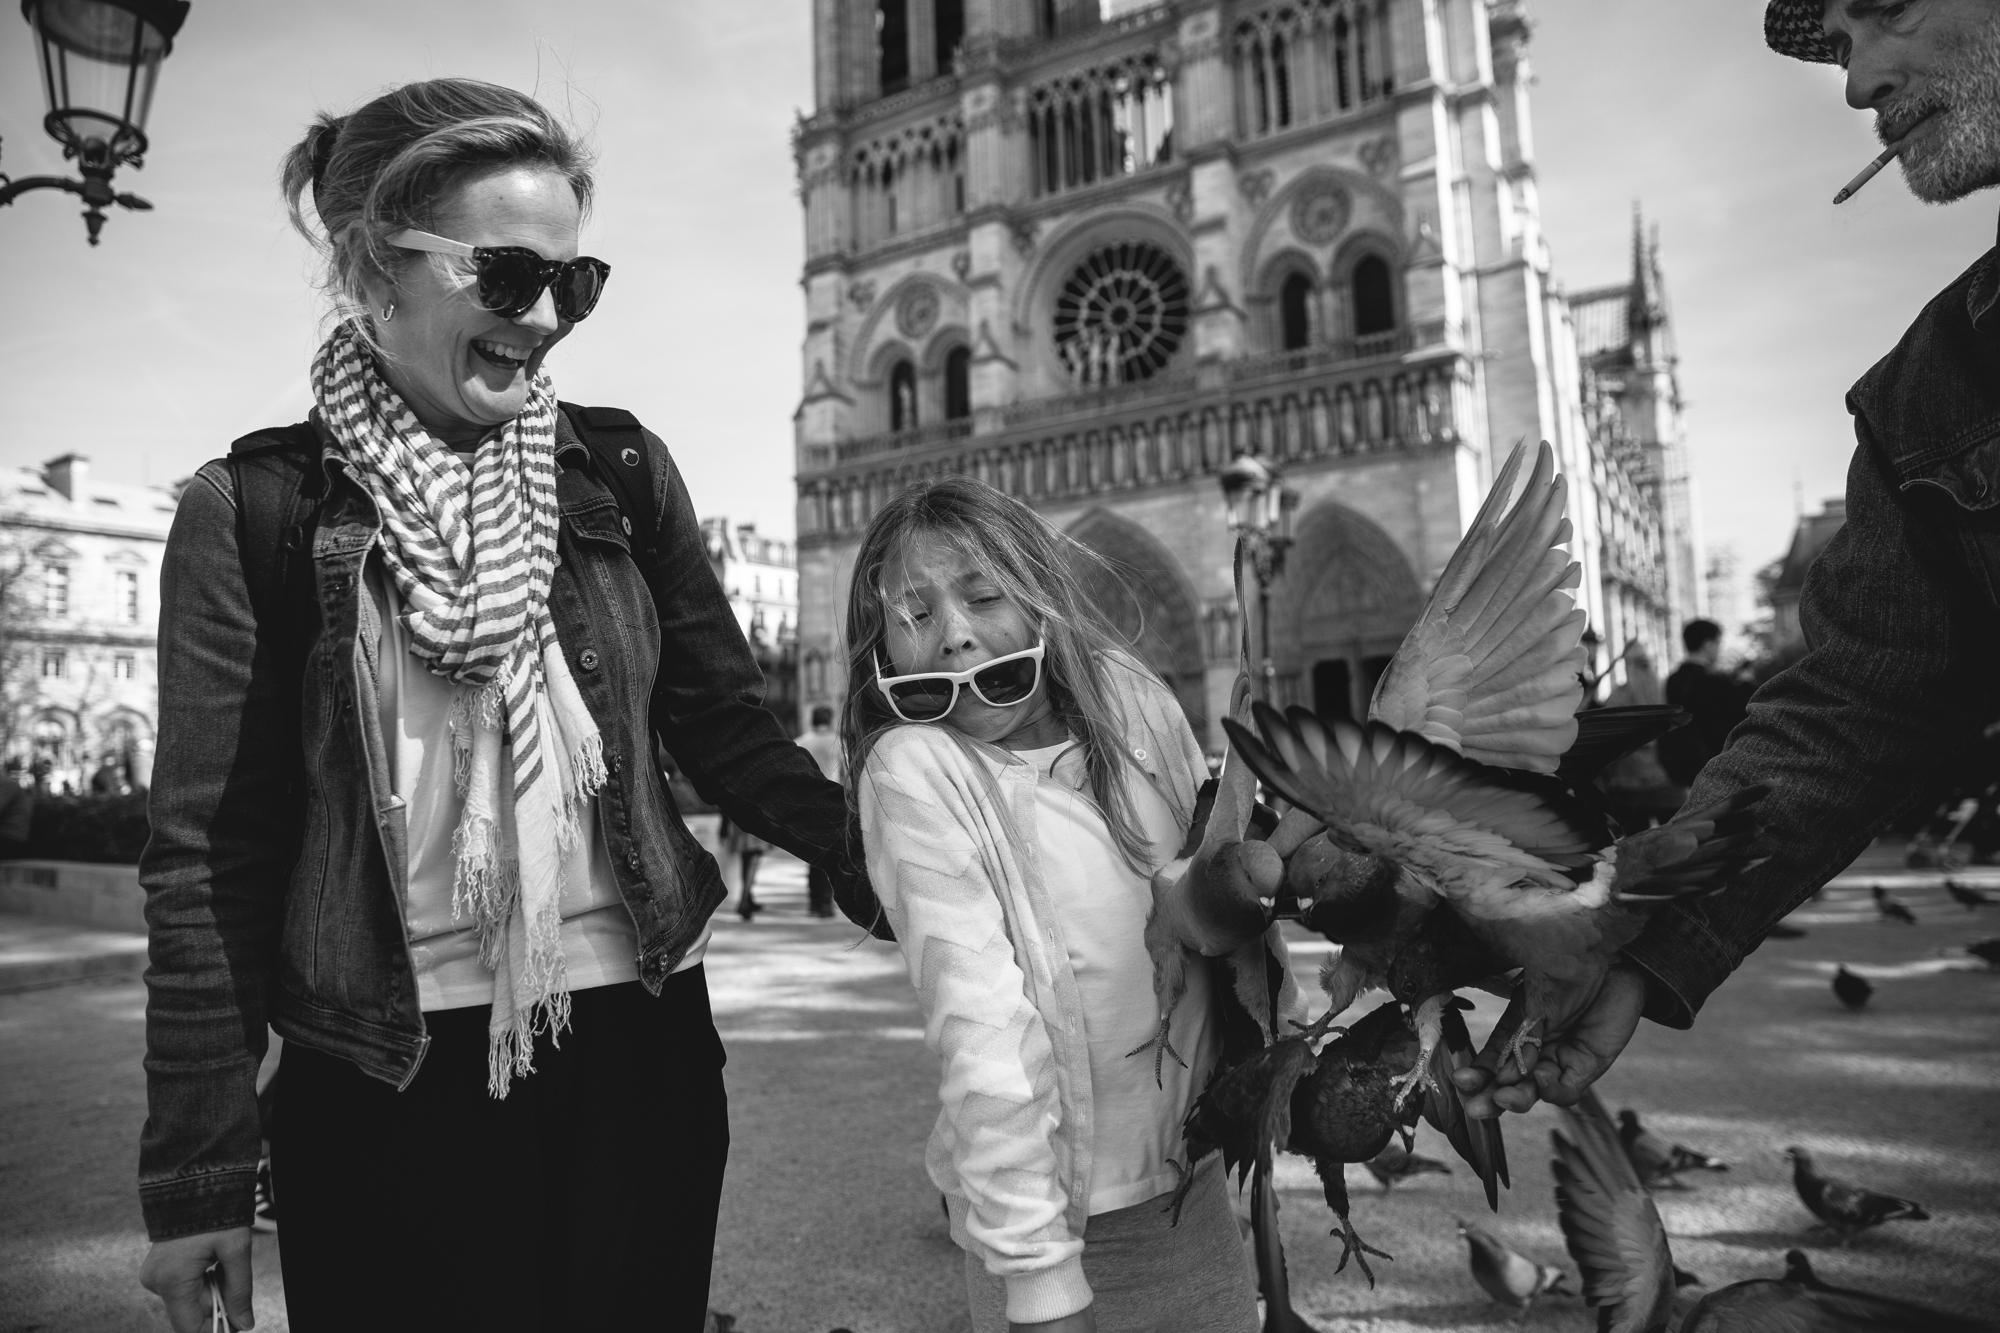 Jay_Farnworth_Man_with_Pigeons_in_Paris